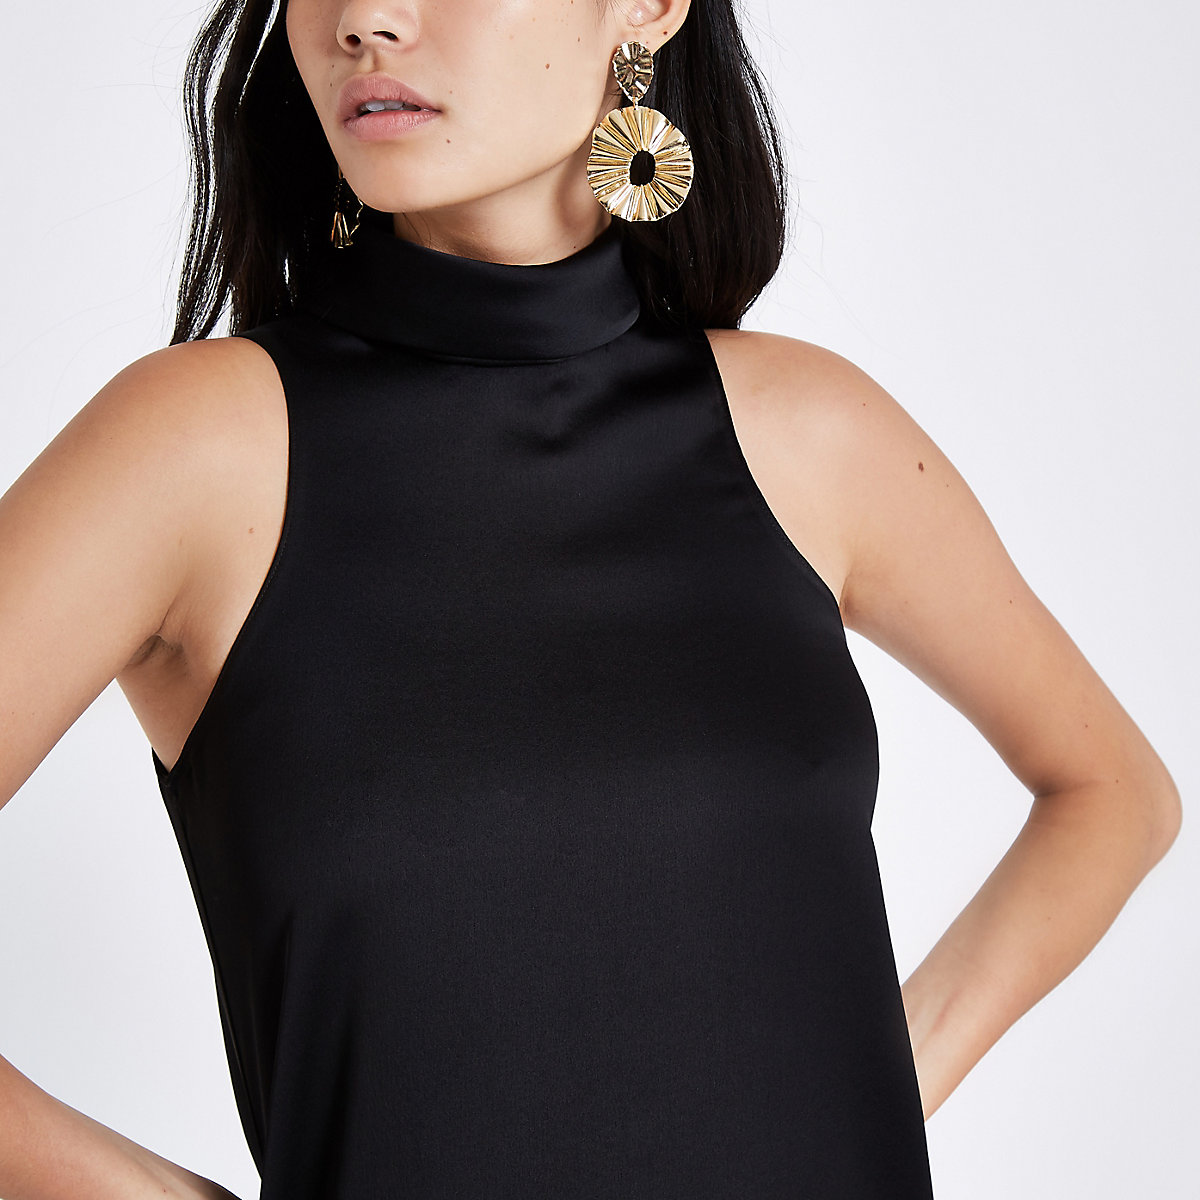 Black satin high neck top